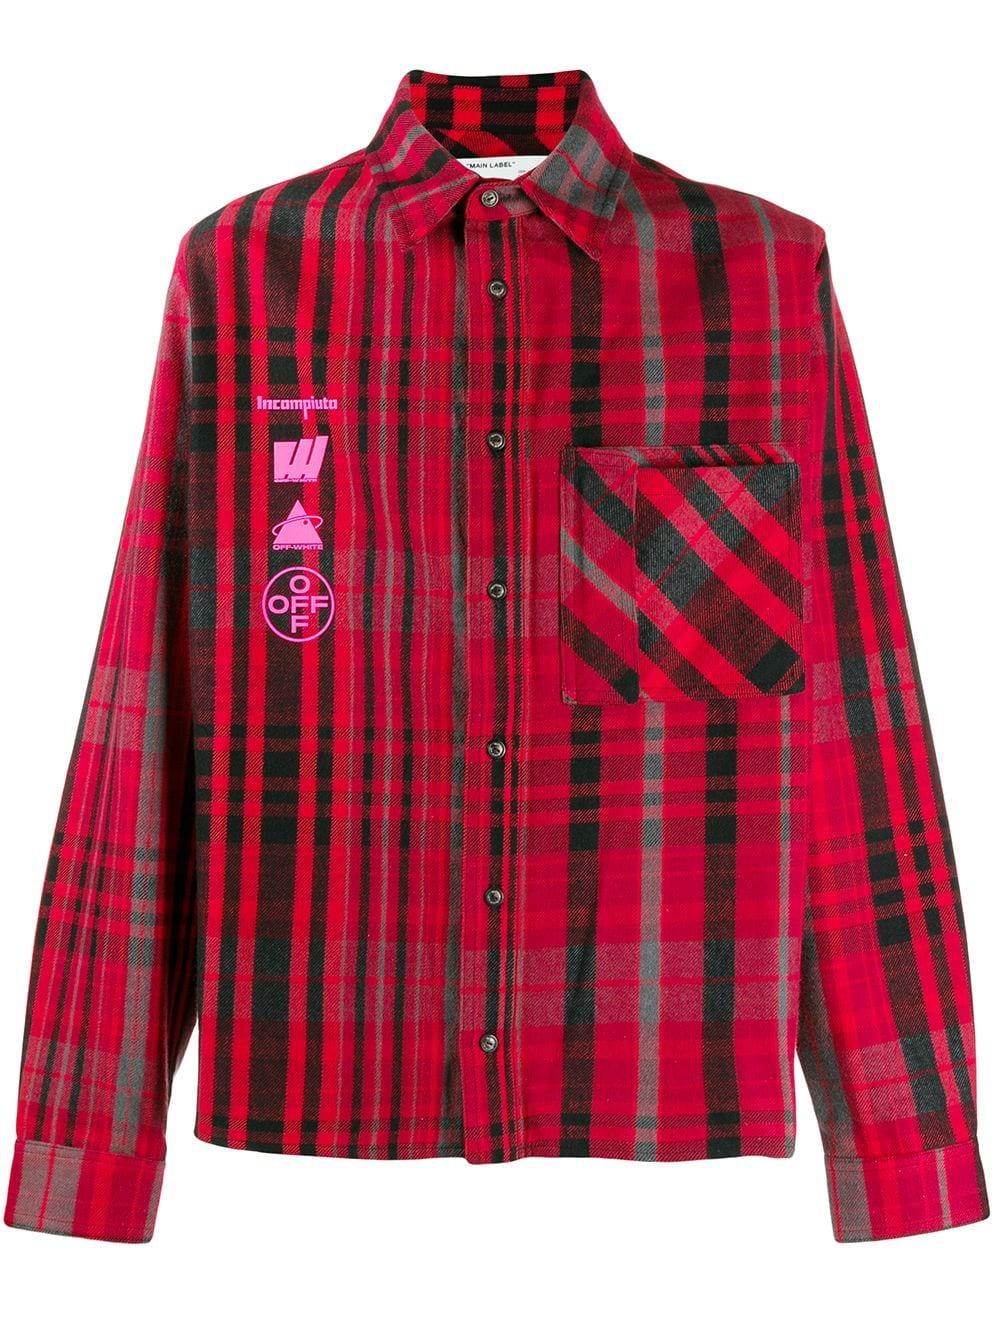 Mariana De Silva Checked Cotton Blend Flannel Shirt In Red Check Shirt Plaid Shirt Off White [ 1334 x 1000 Pixel ]